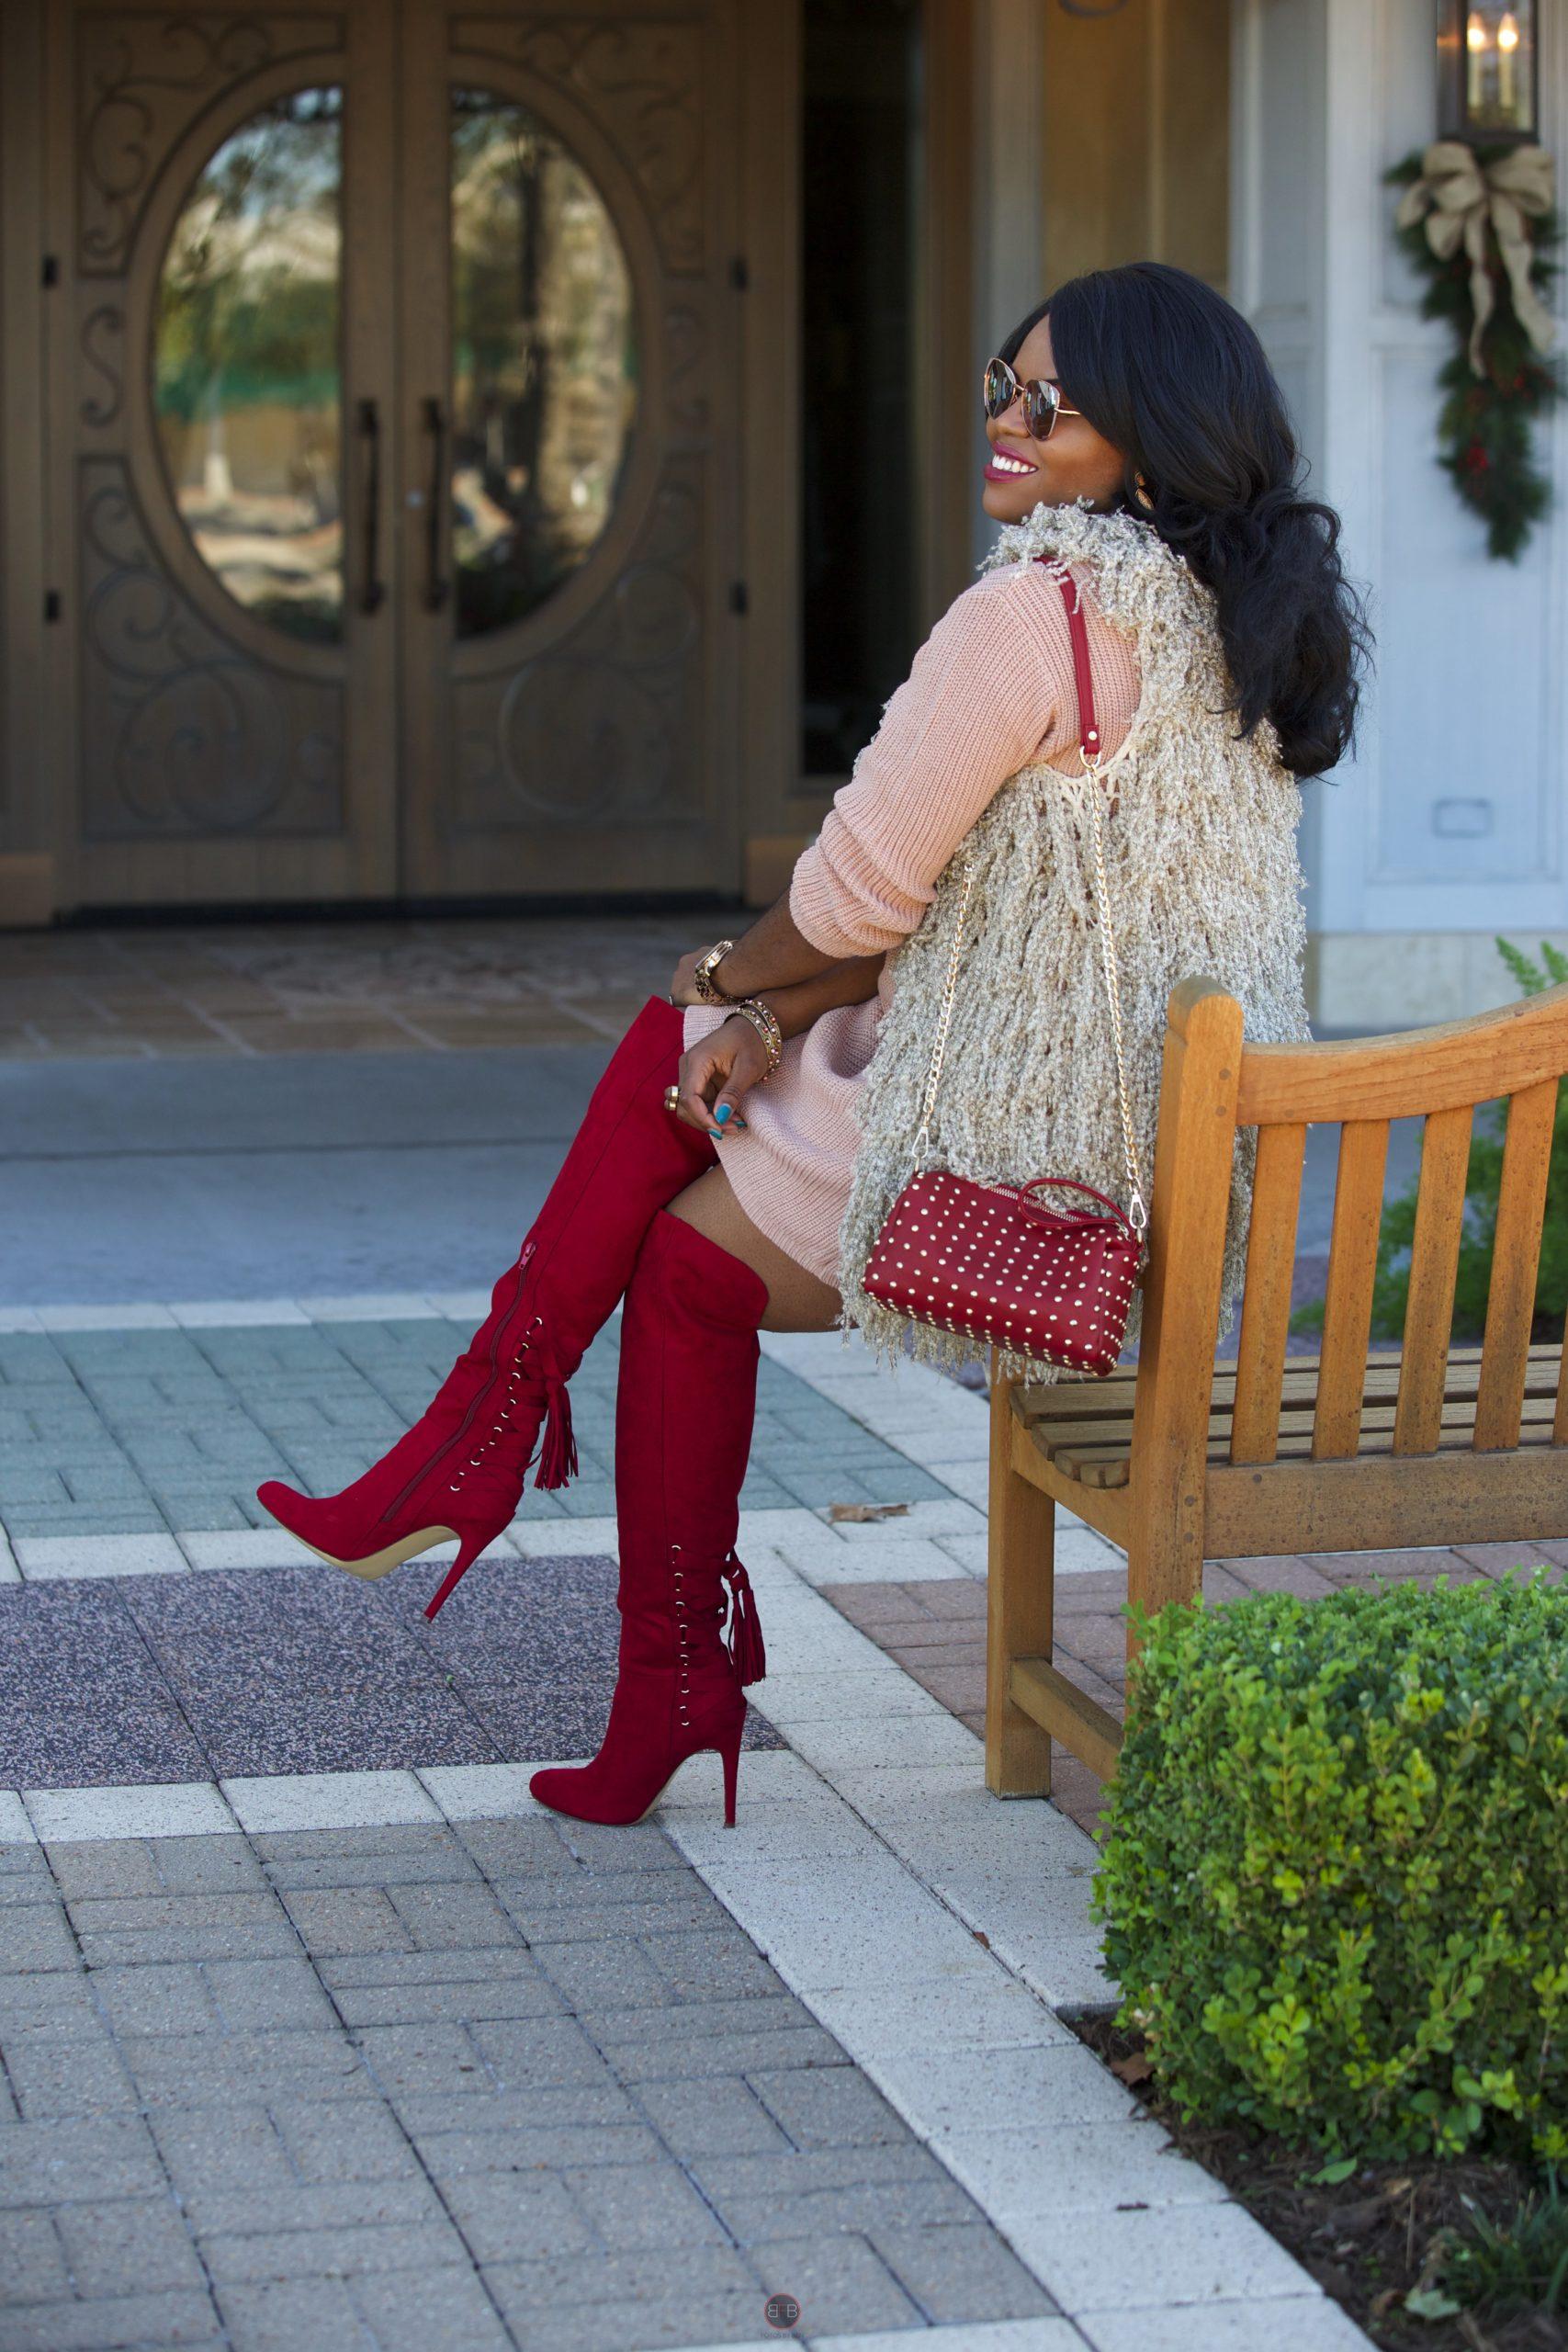 Chigis World Tobi Sweater Dress Shoedazzle Jemiah Boots Rock stud handbag Fall Fashion